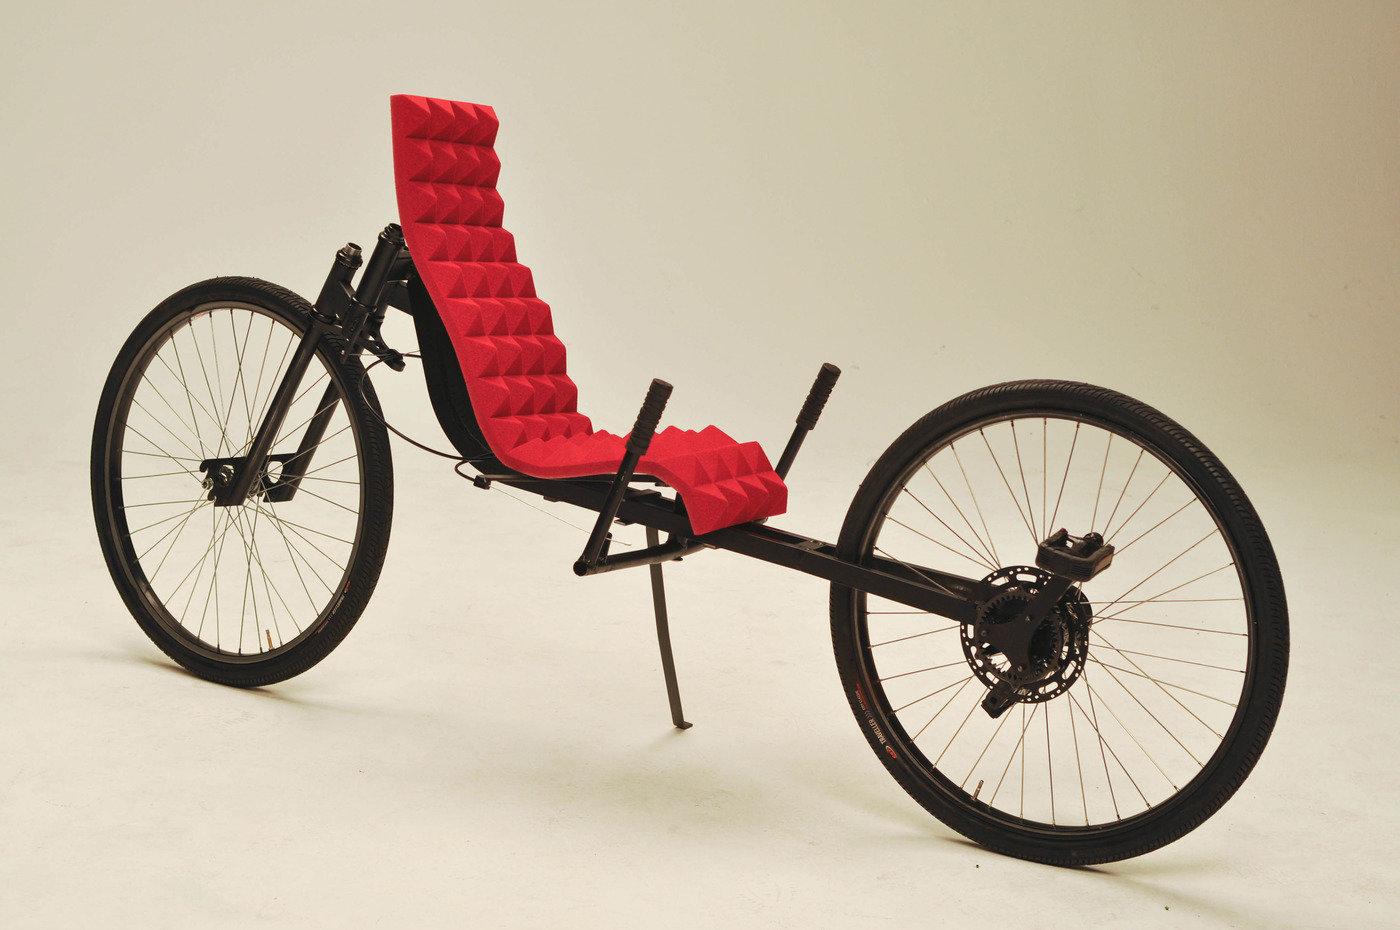 Rws Recumbent Bike By Mohsen Saleh At Coroflot Com